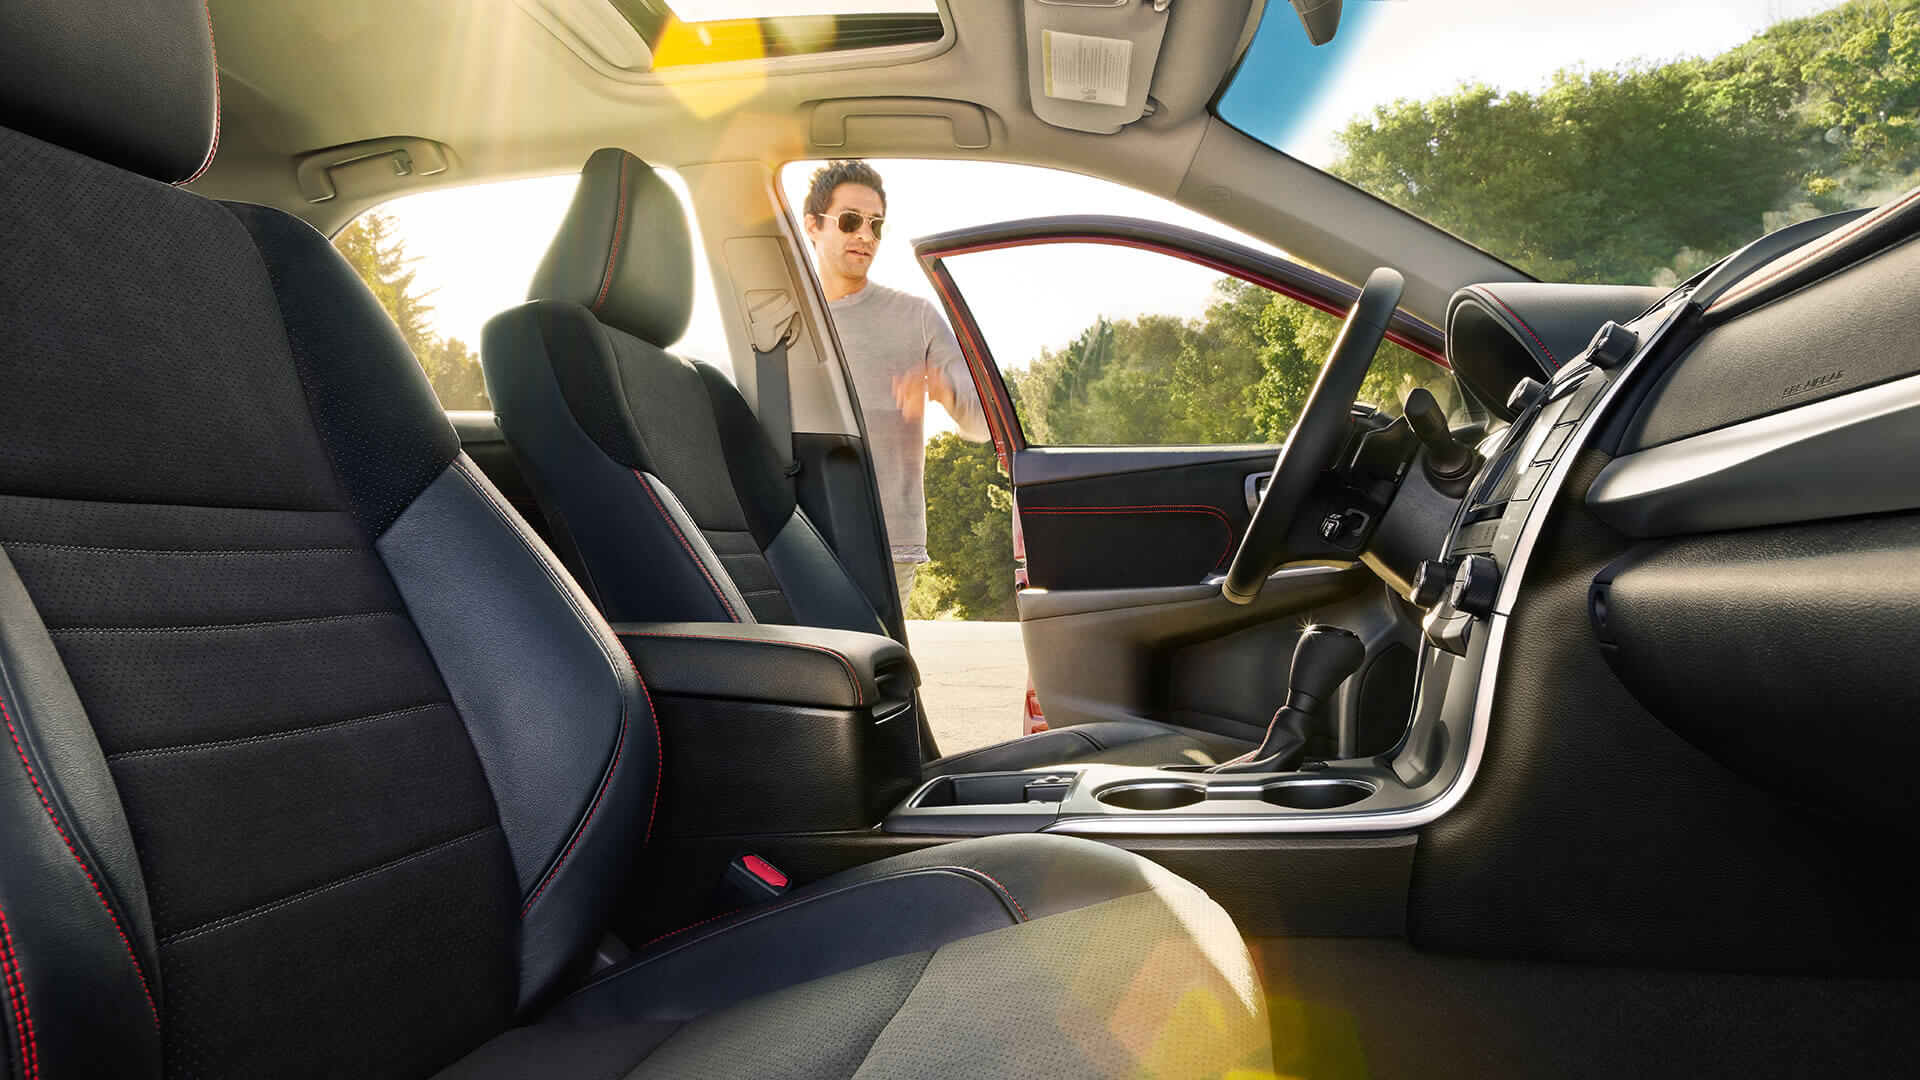 2017 Toyota Camry seats